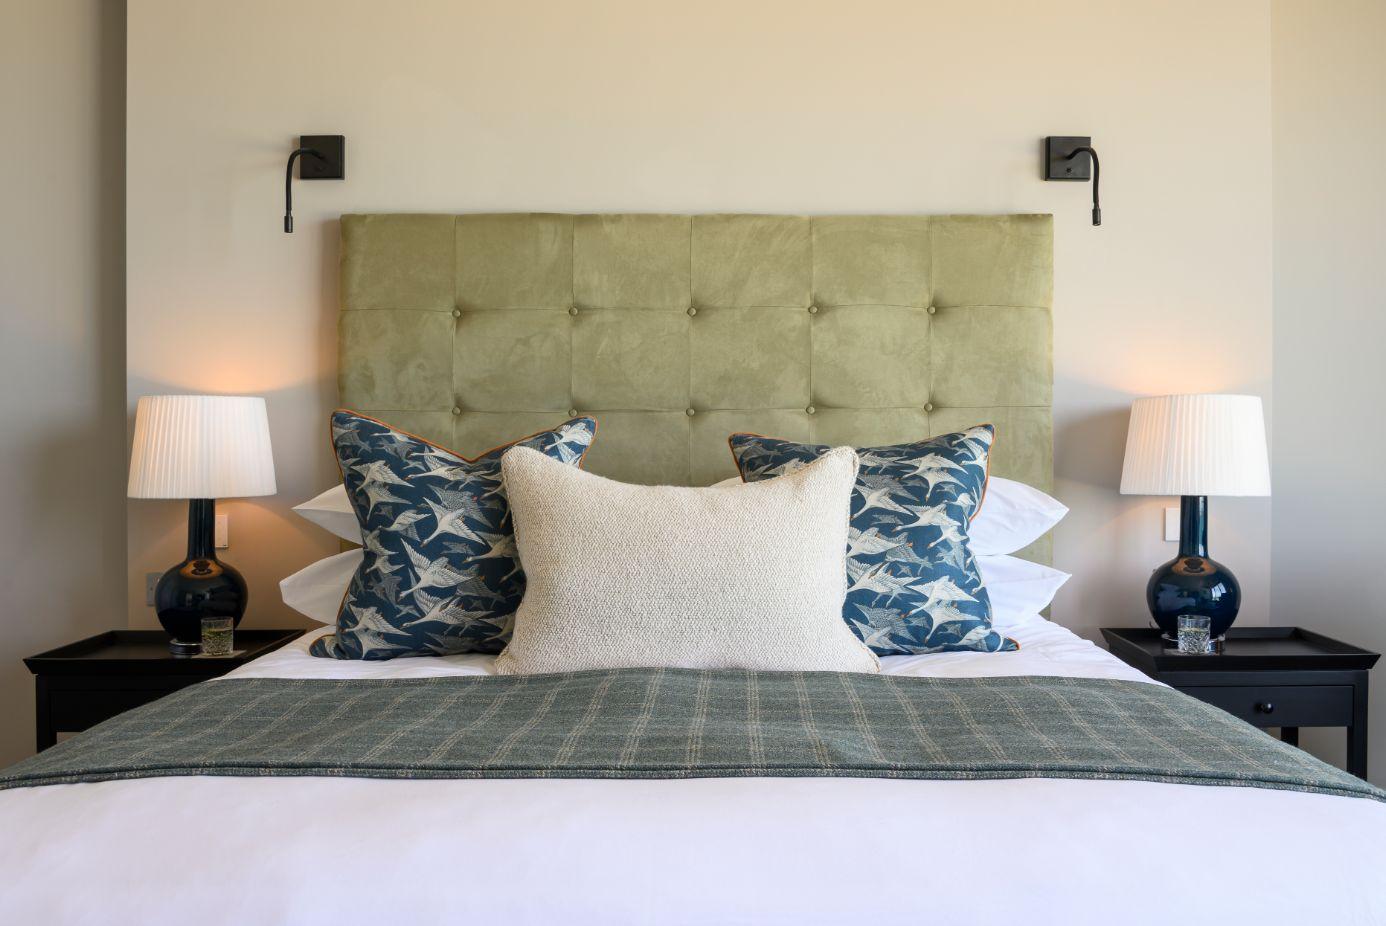 CARBIS BAY HOTEL & ESTATE